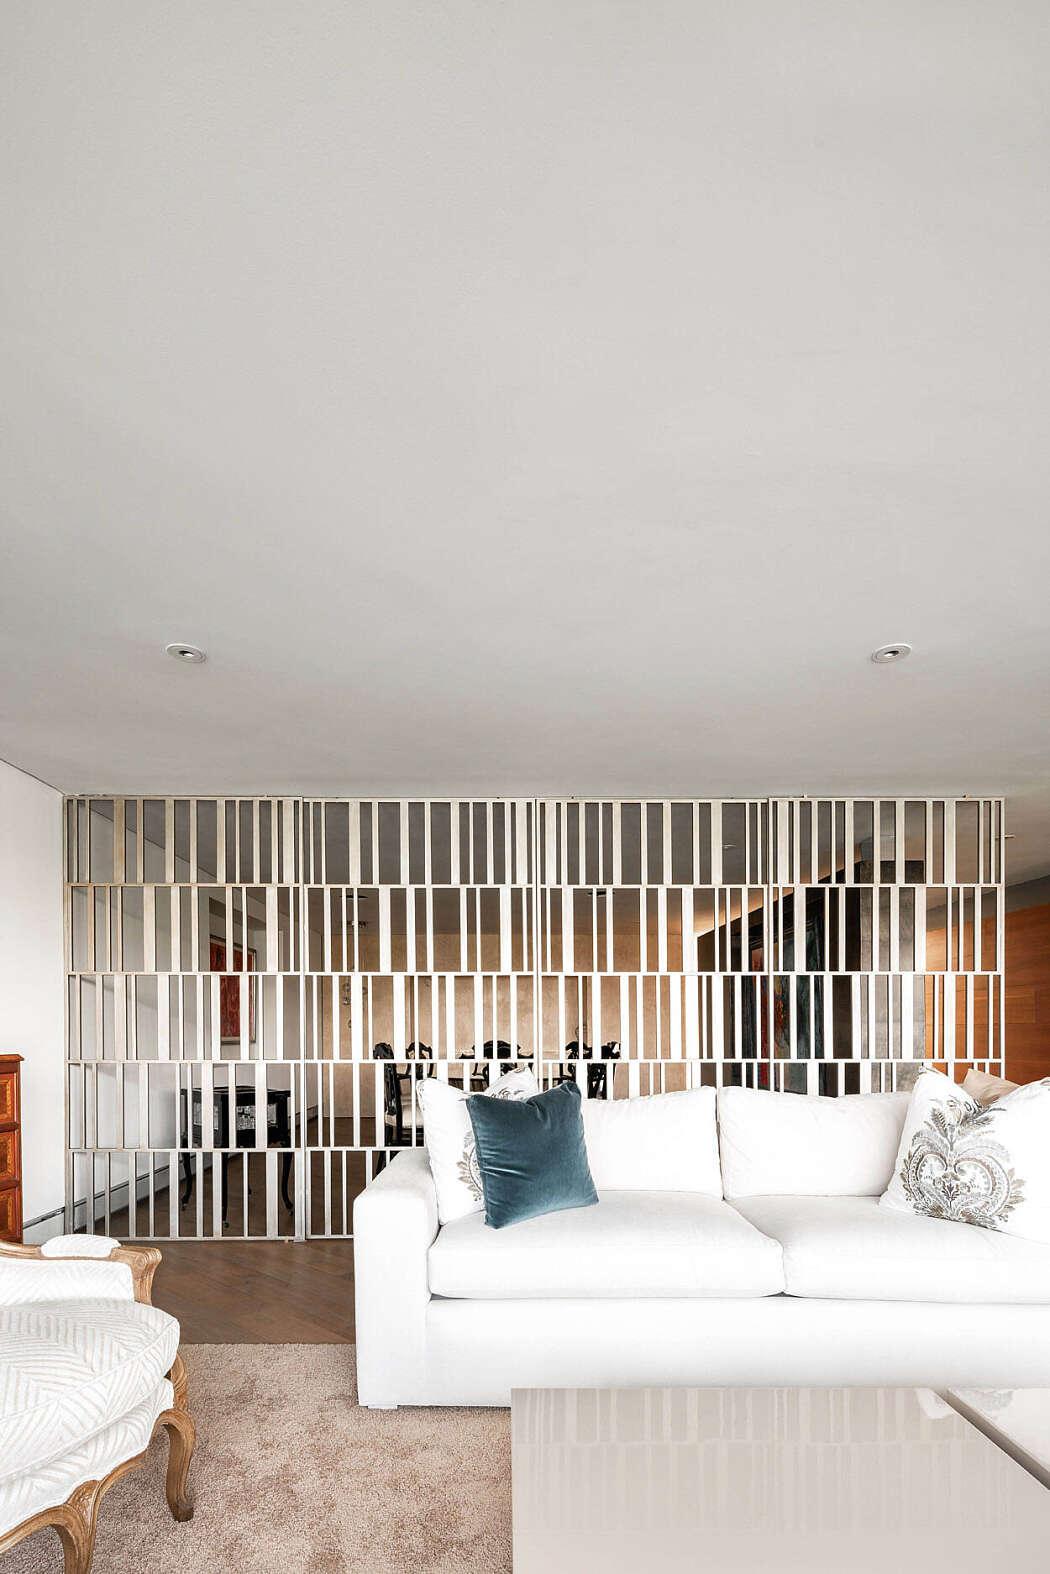 Tamarindos by Baso Arquitectura